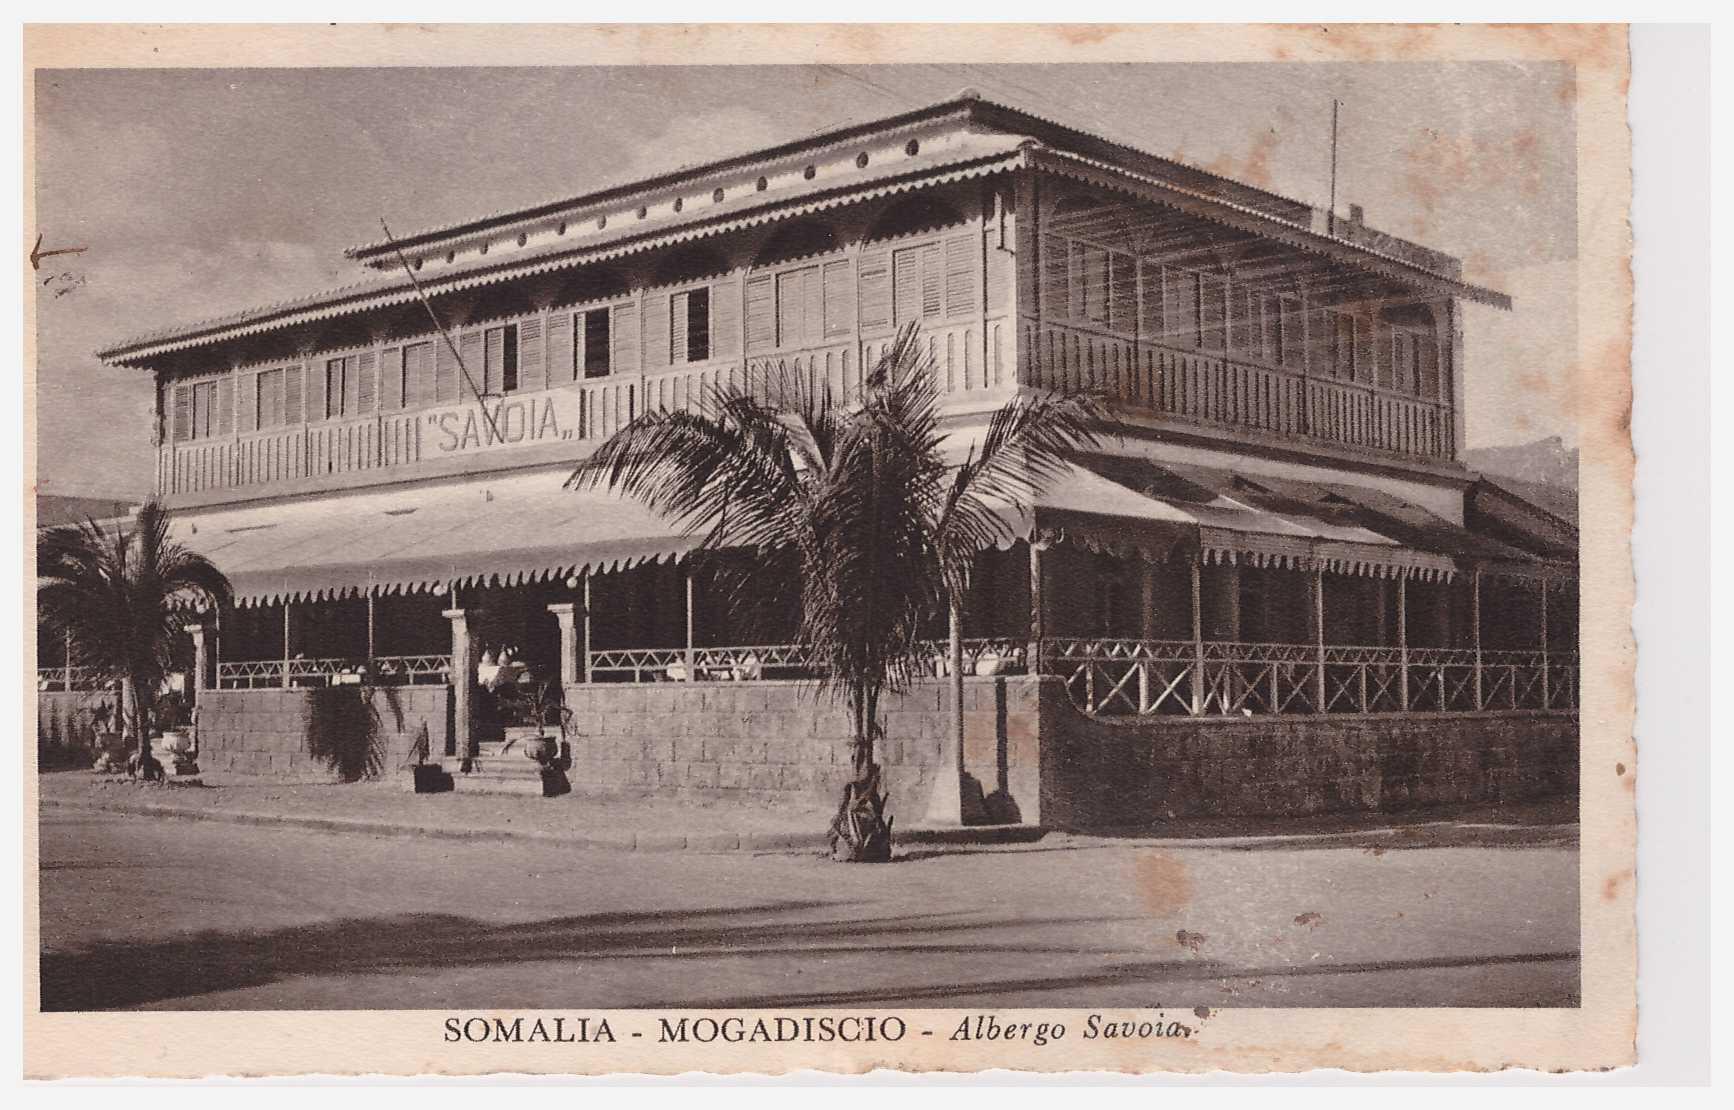 Albergo Savoia